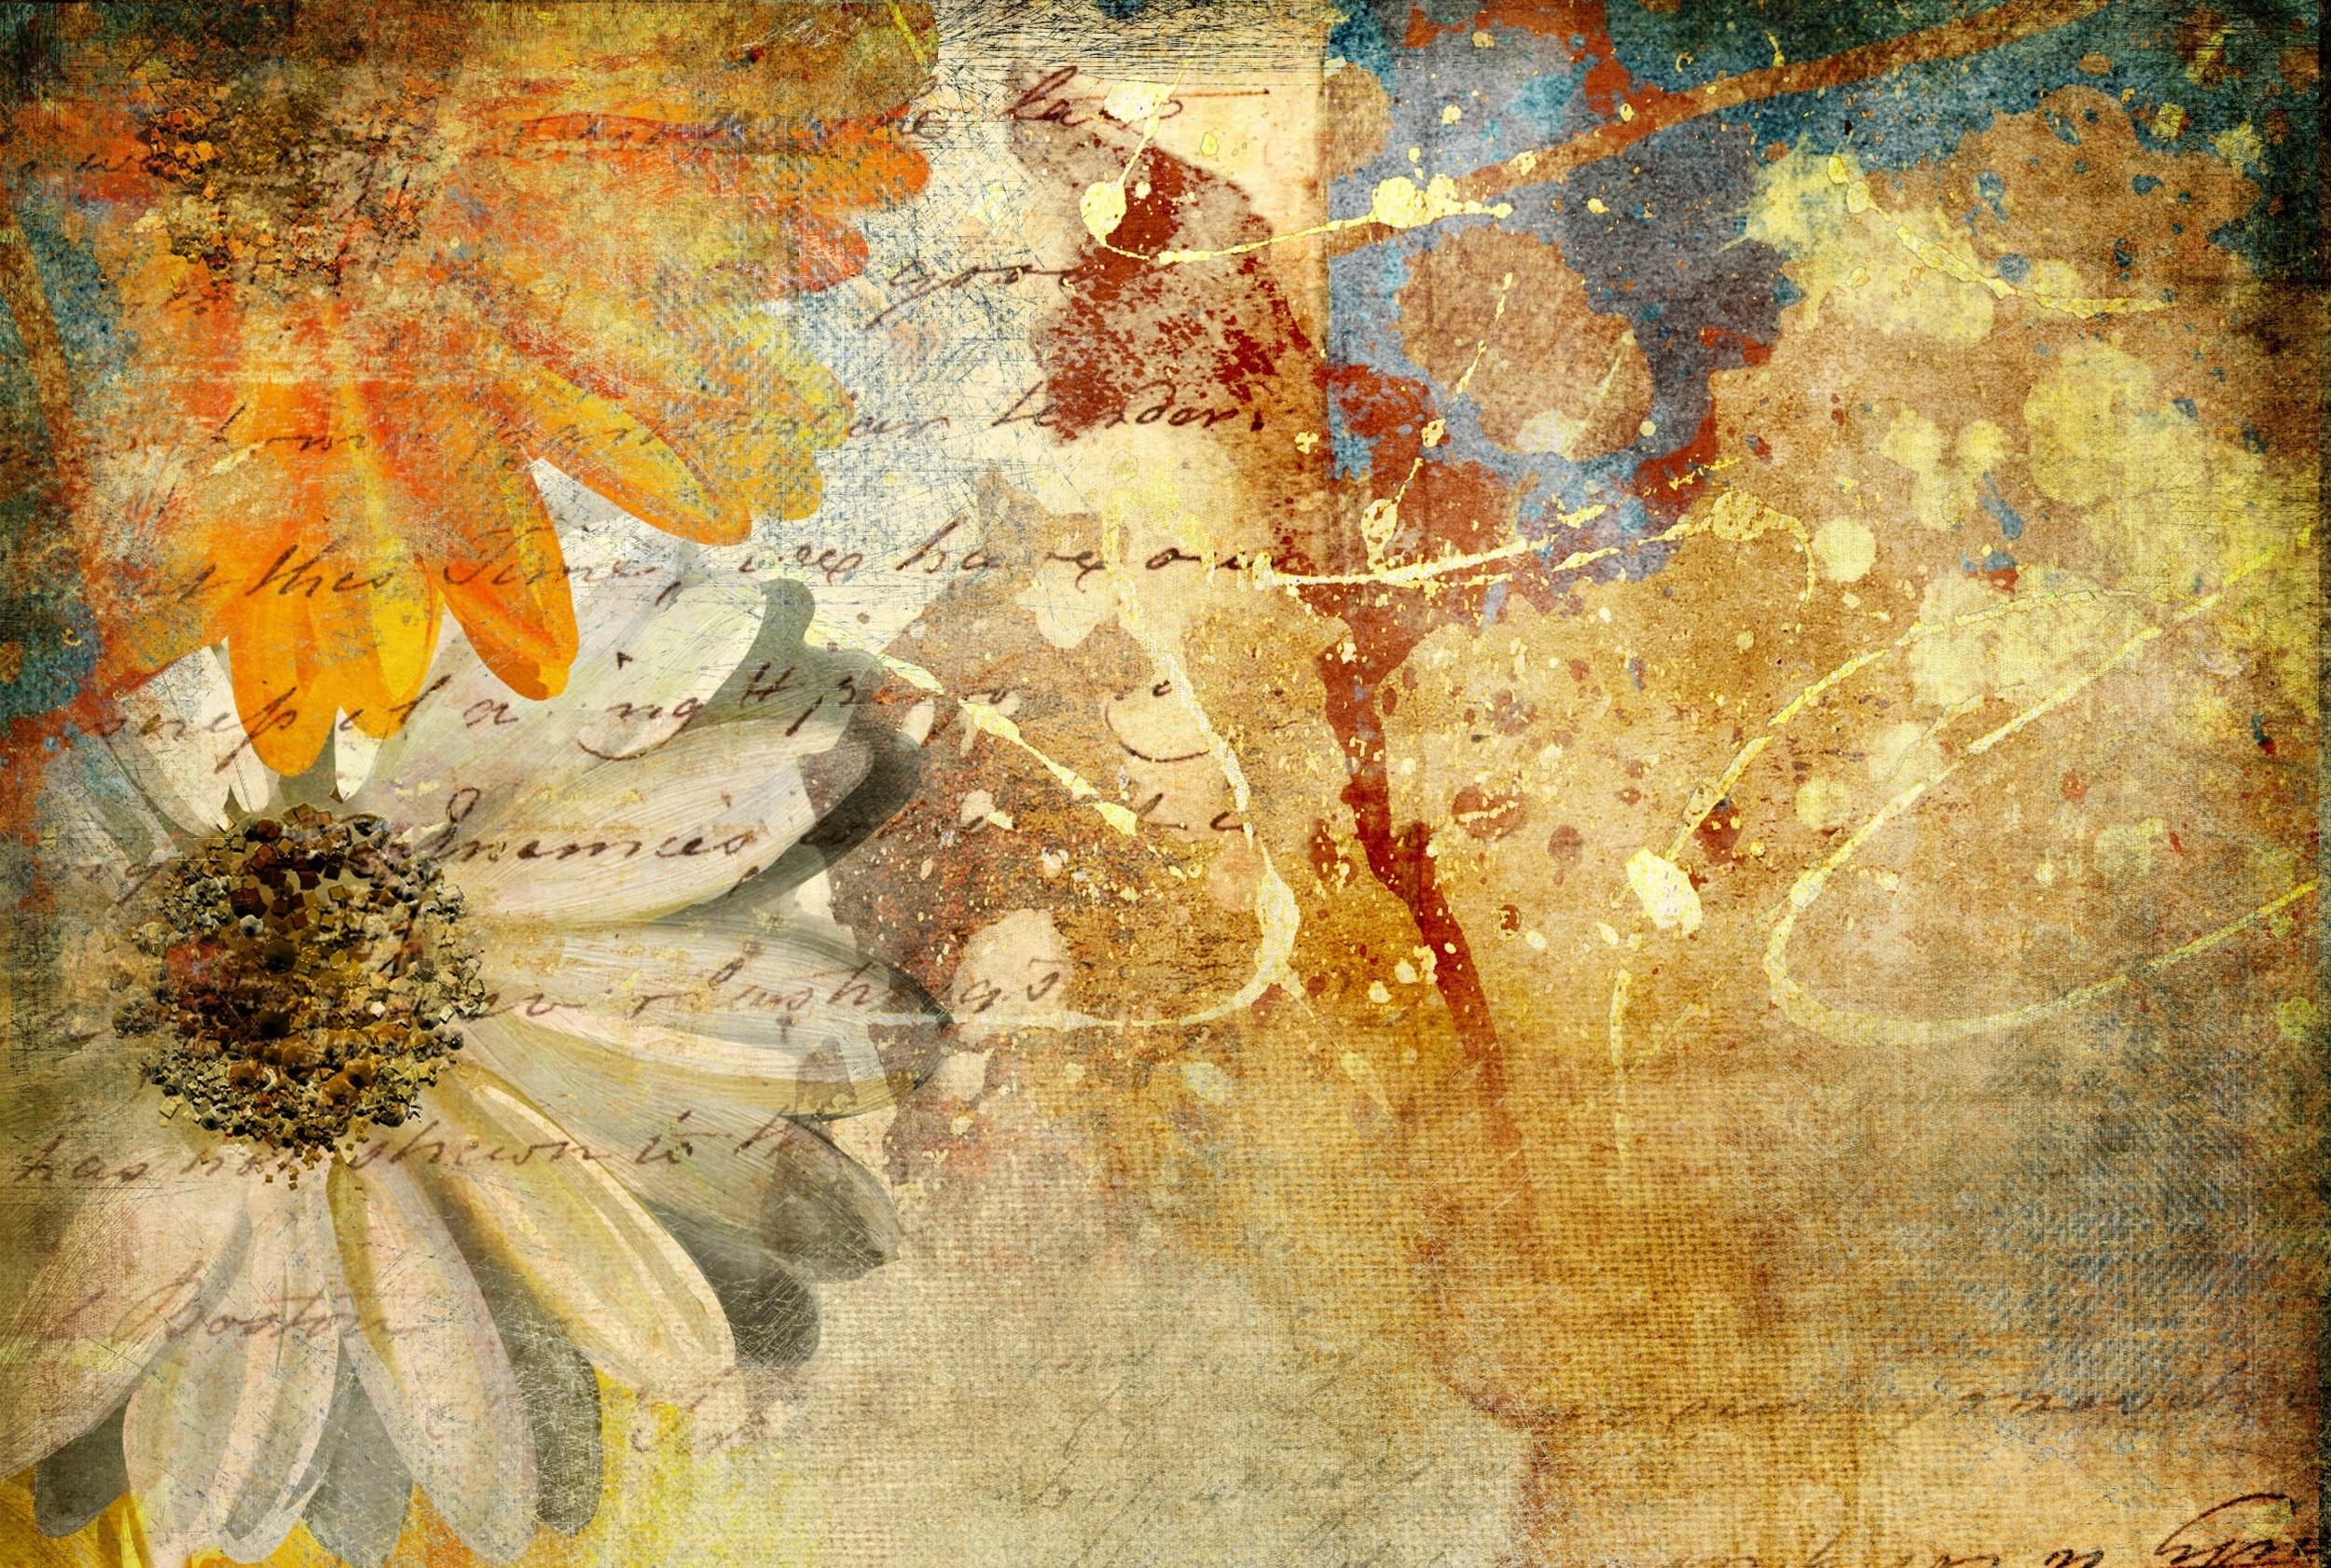 Retro Desktop Wallpaper: Retro Desktop Backgrounds (72+ Images